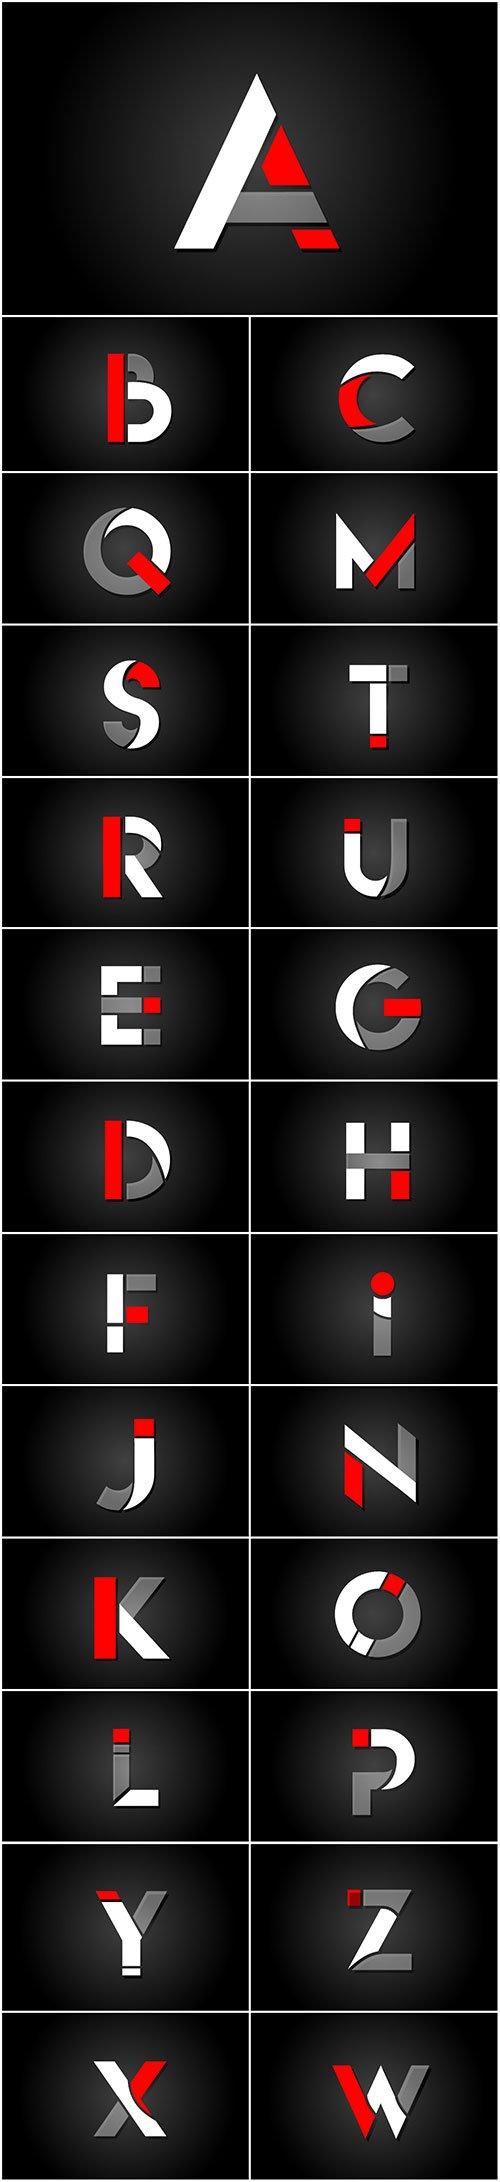 Red white black alphabet letter logo for company icon design